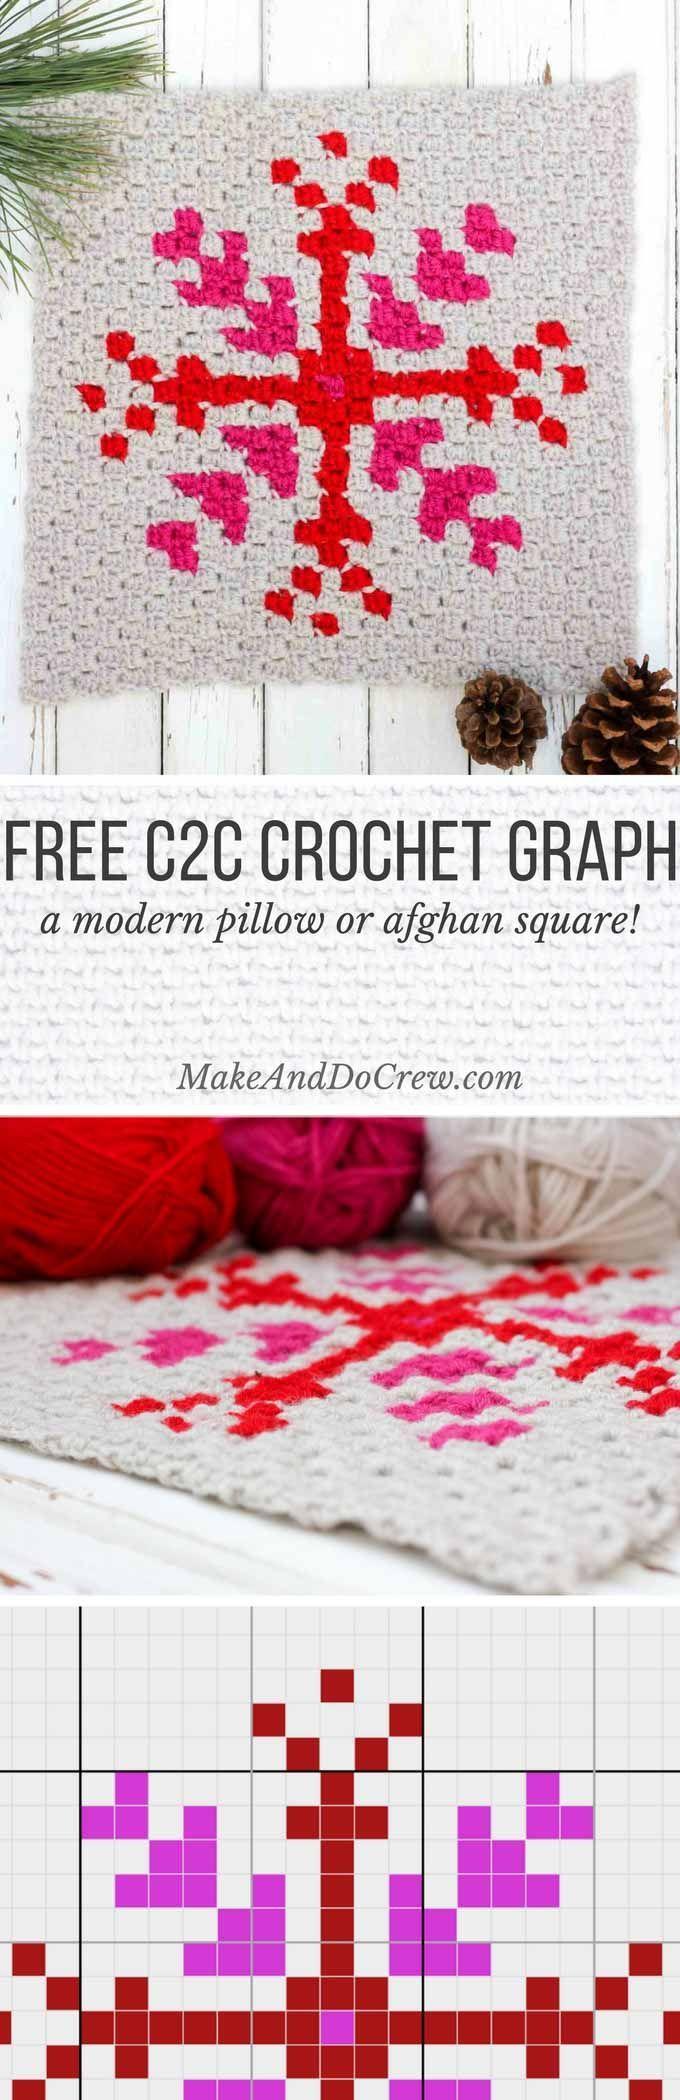 List Of Pinterest Snowflake Crochet Pattern Blanket Images Snowflakescrochetpatterndiagram Free C2c Graph